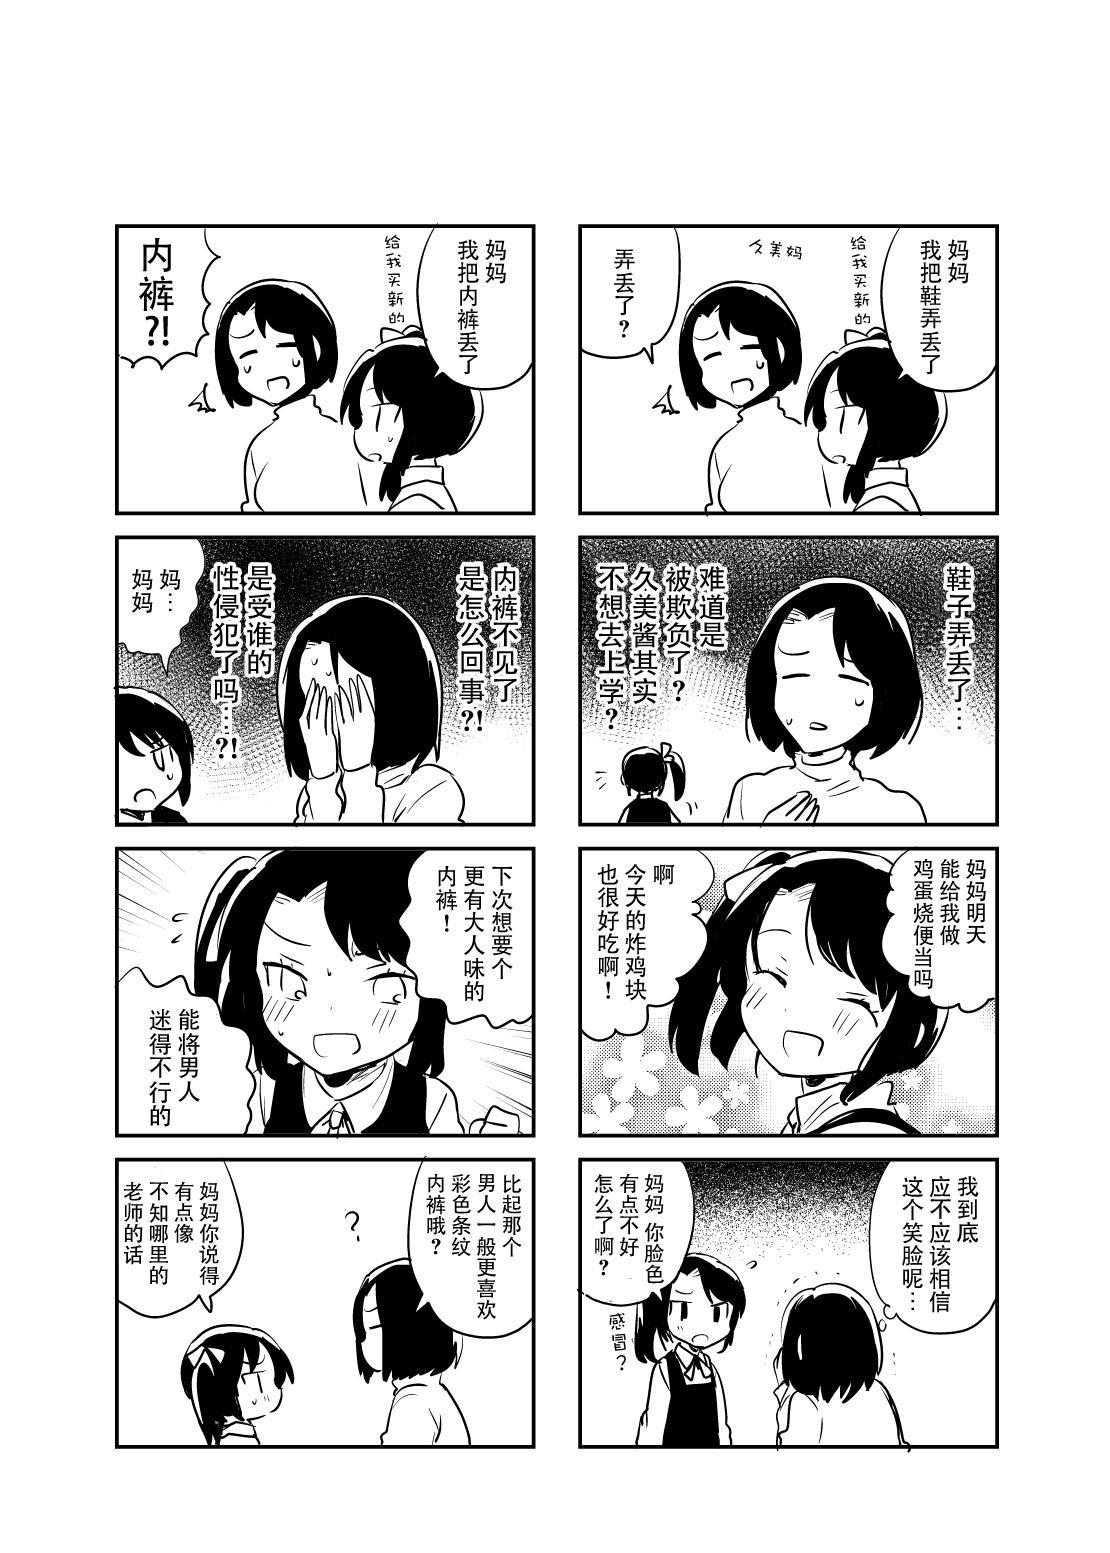 (SC2018 Spring) [squeezecandyheaven (Ichihaya)] Sensei wa Lolicon de Saitei Hentai no Gomikuzu [Zen] + Omake [Chinese] [脸肿汉化组] 29